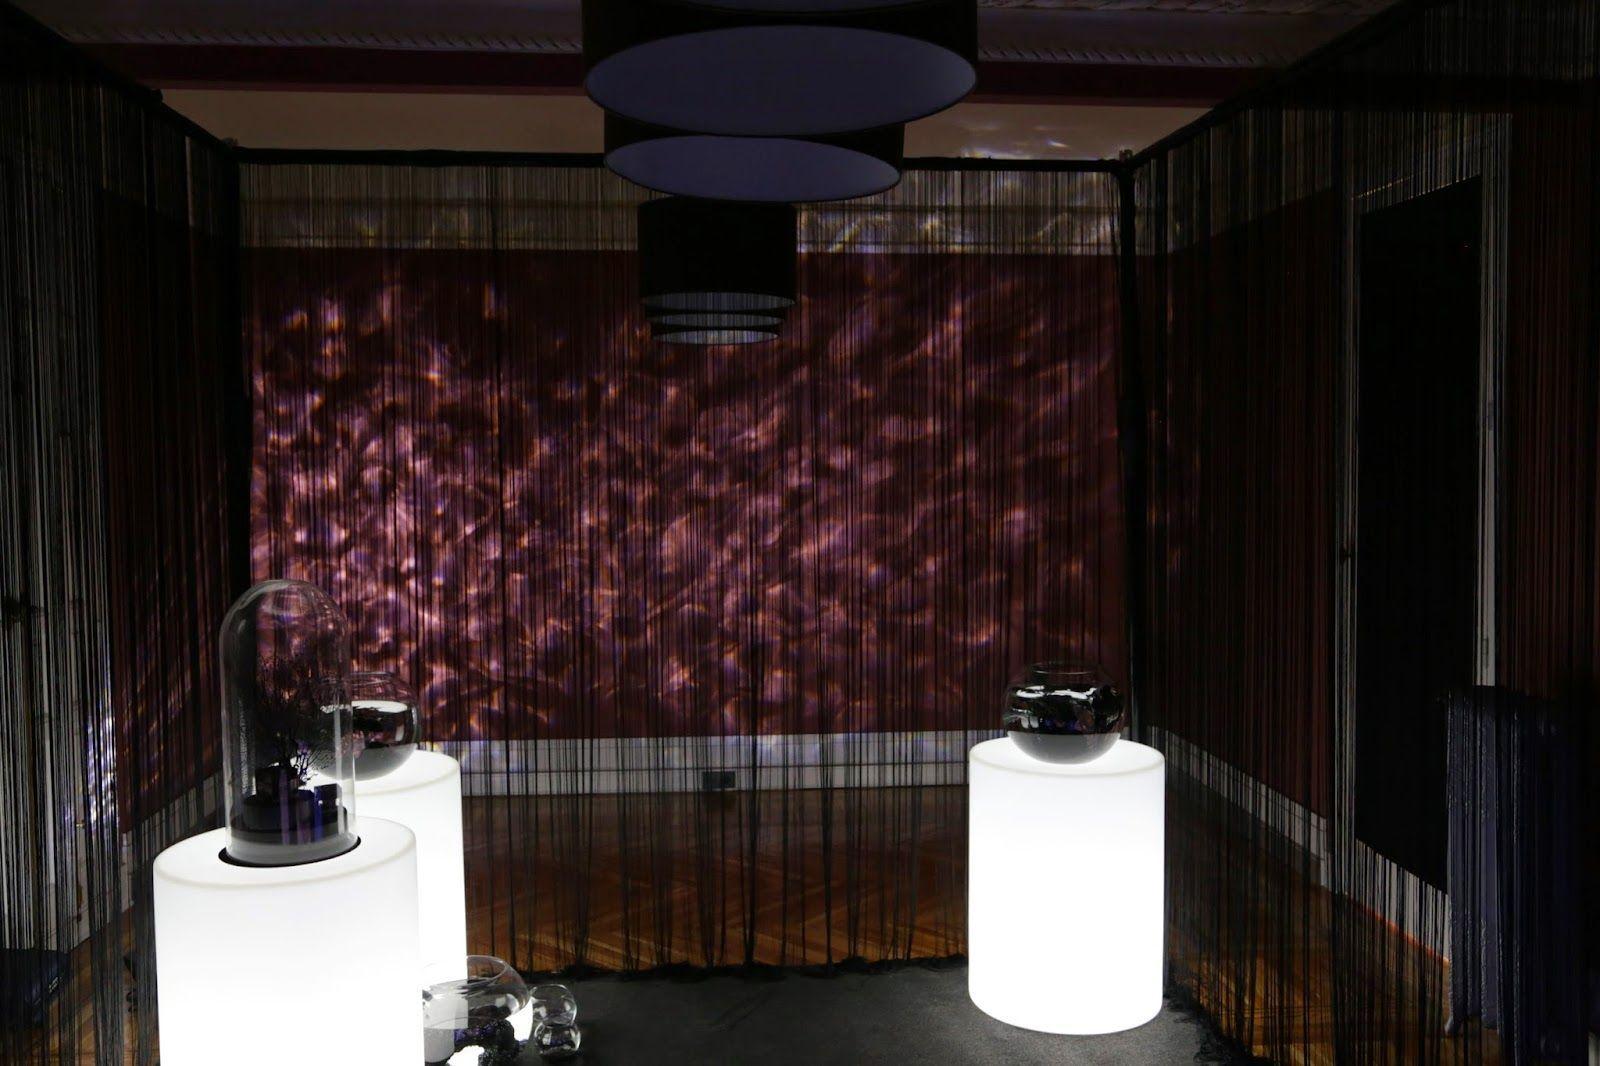 le soin noir, tratamiento anti-edad, Givenchy, evento